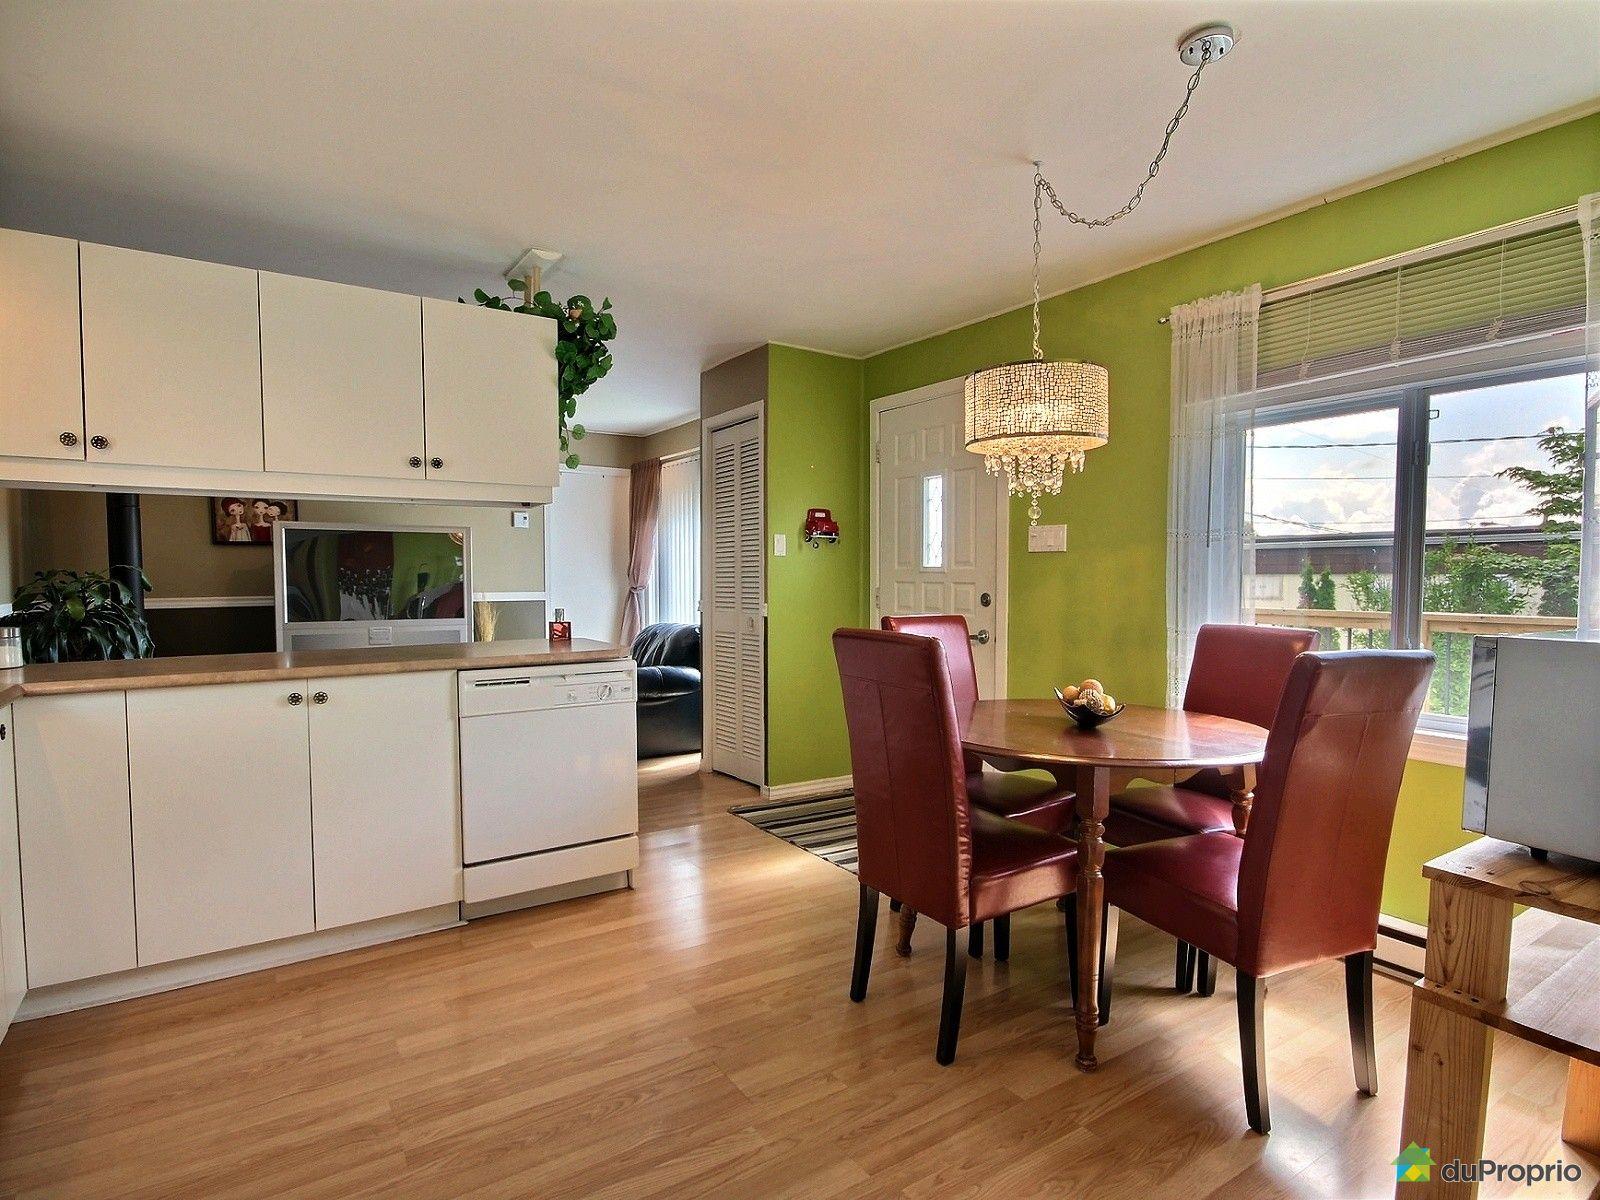 maison vendre beauport 53 rue lucien immobilier qu bec duproprio 629051. Black Bedroom Furniture Sets. Home Design Ideas